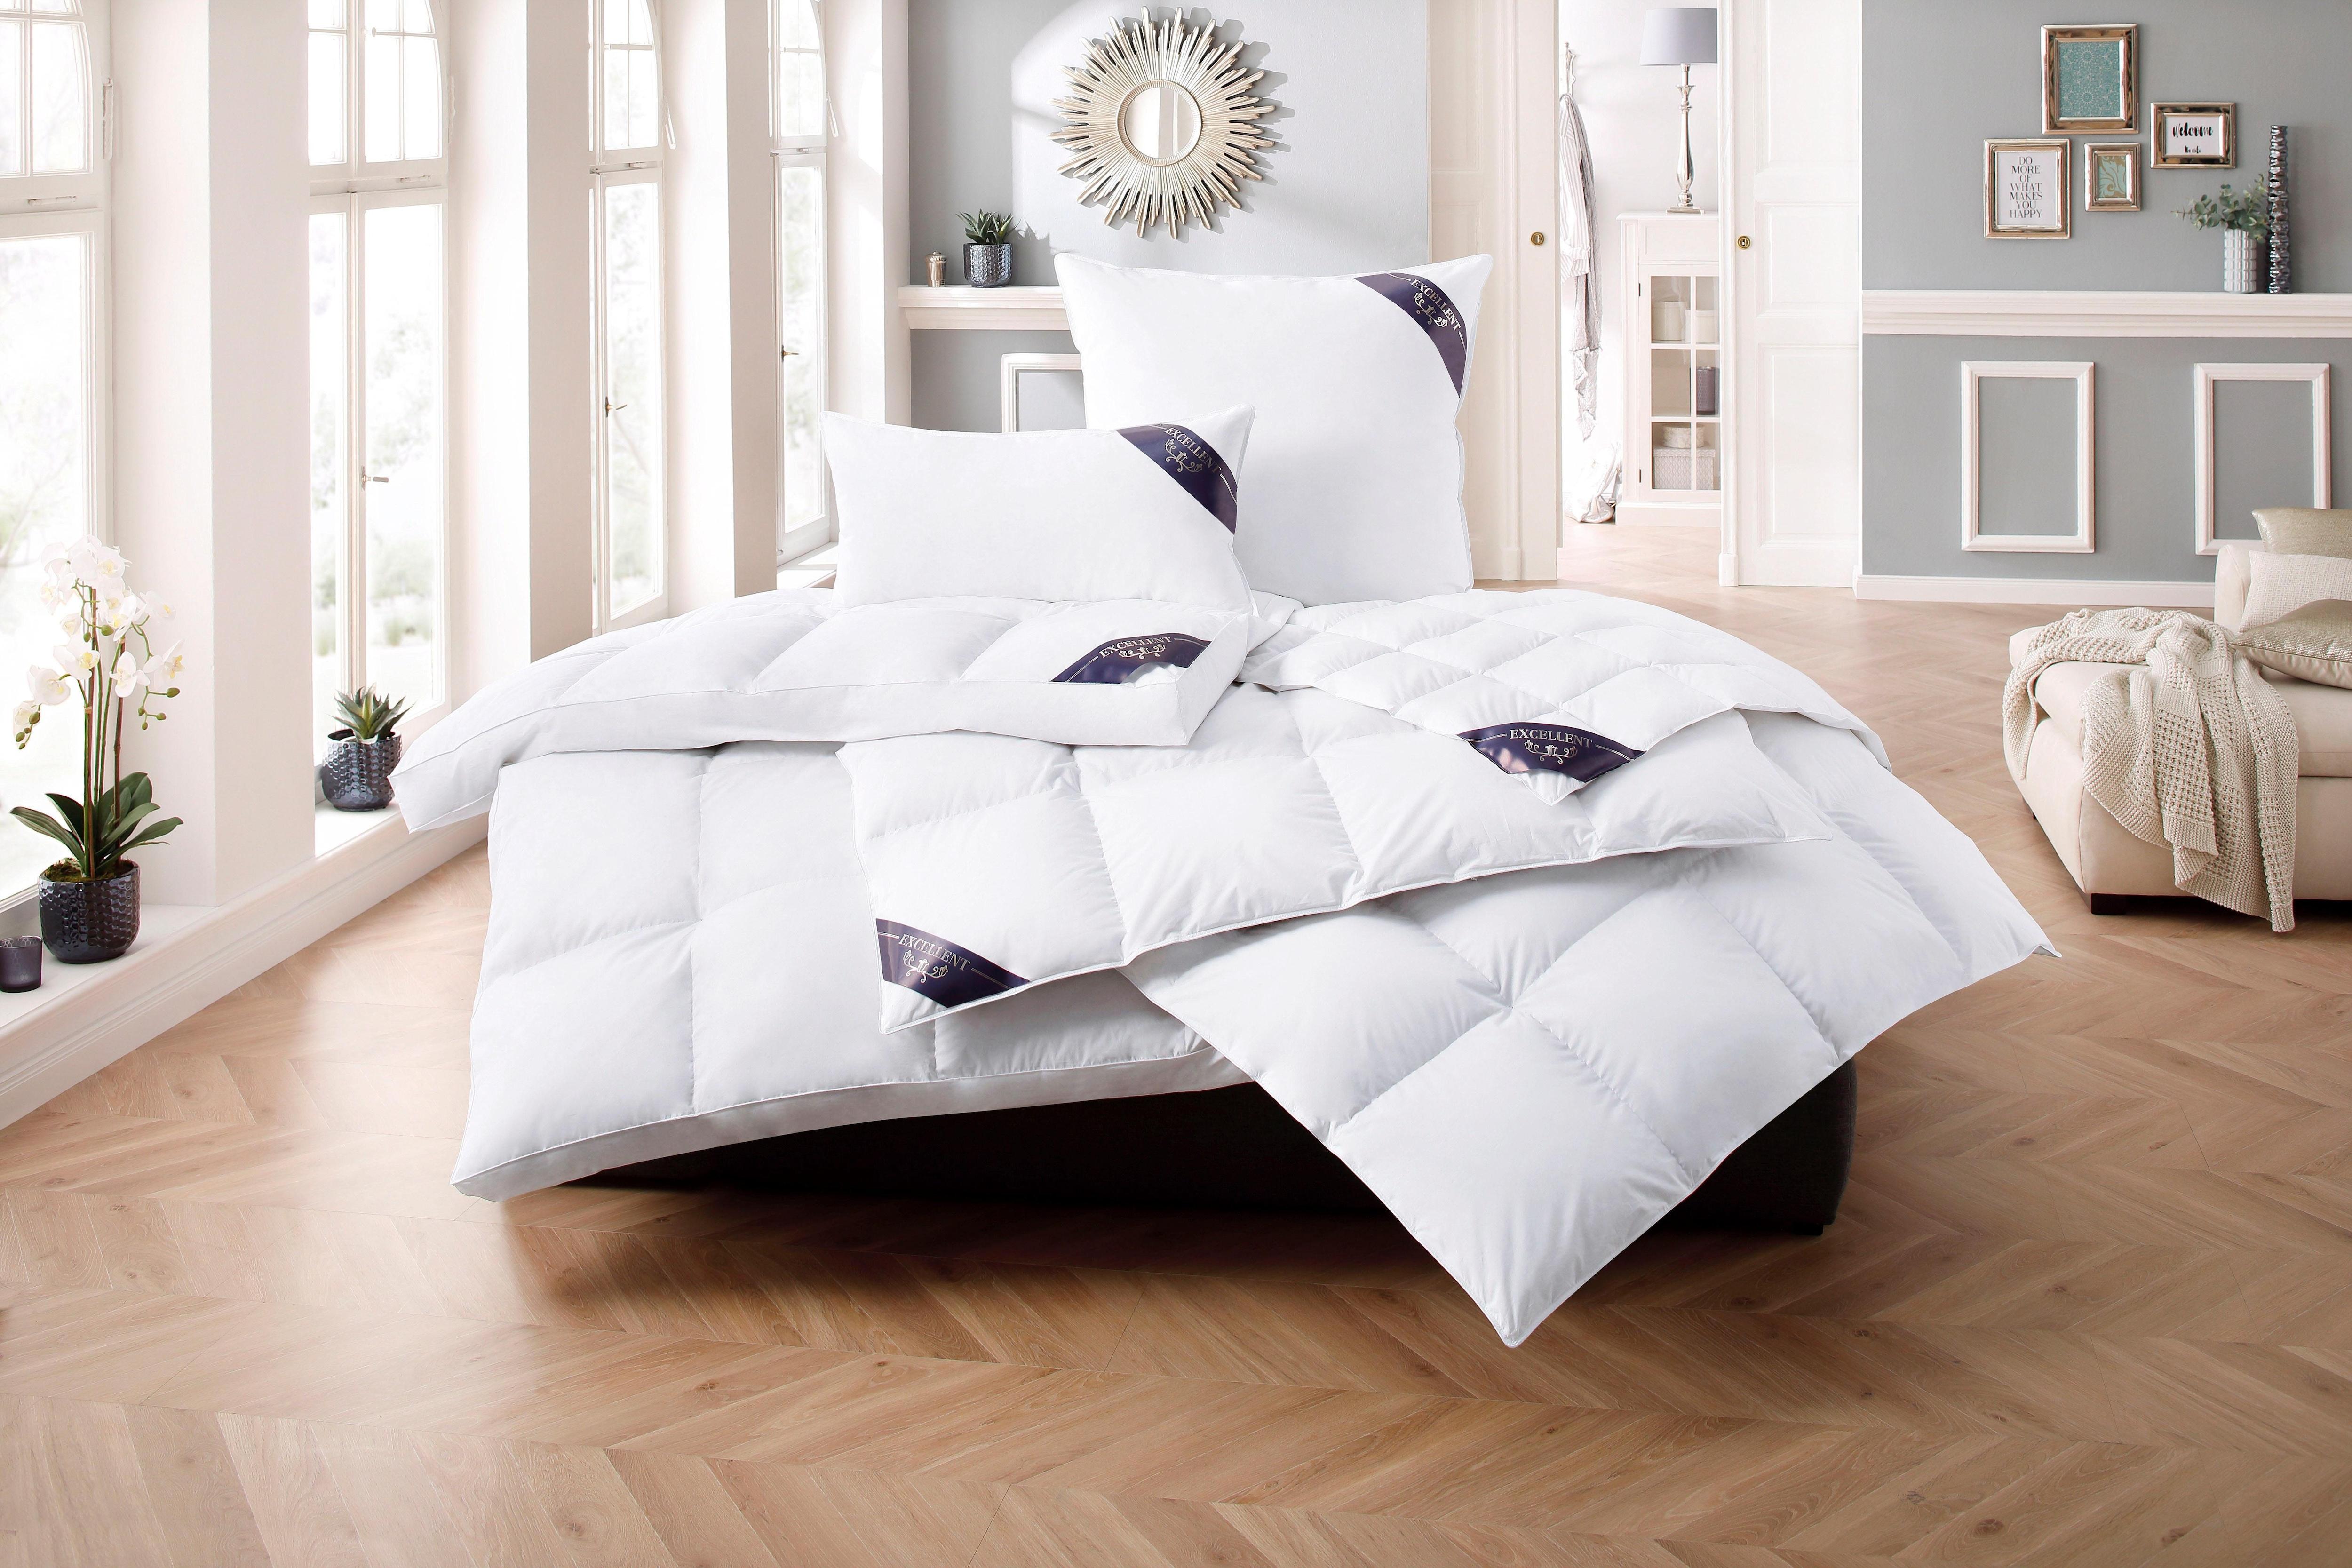 Daunenbettdecke Luxus Excellent warm Füllung: 80% Daunen 20% Federn Bezug: 100% Baumwolle